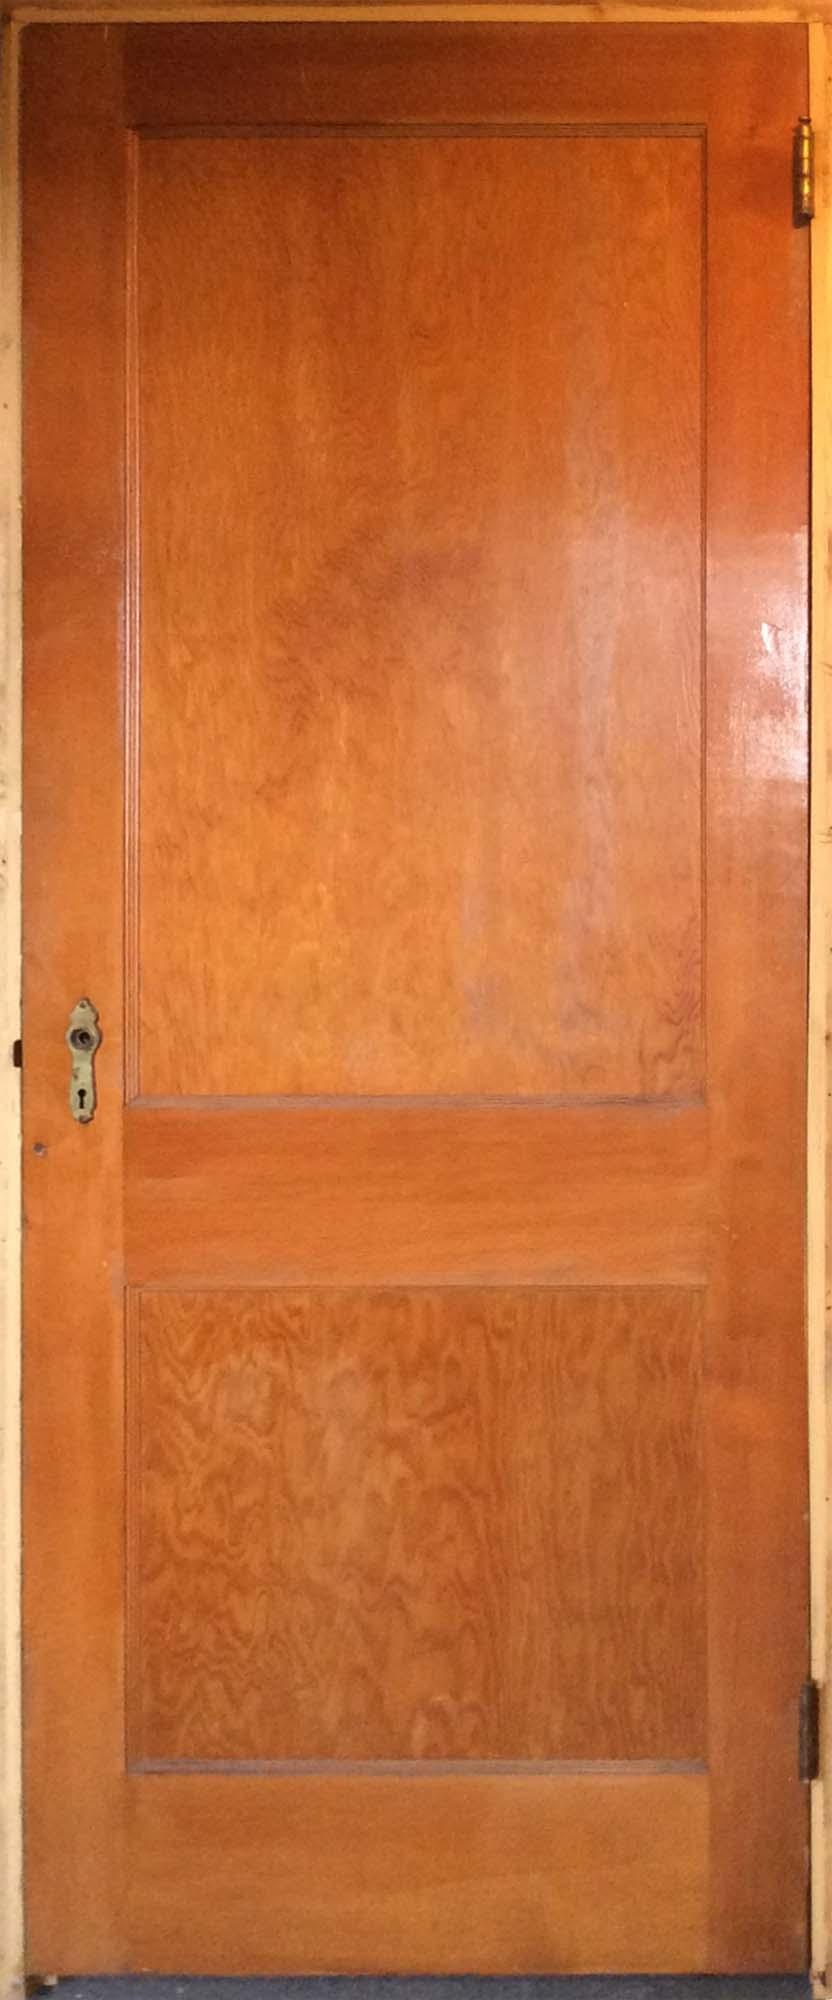 Vintage 2-Panel Doors - All Doors — Portland Architectural Salvage